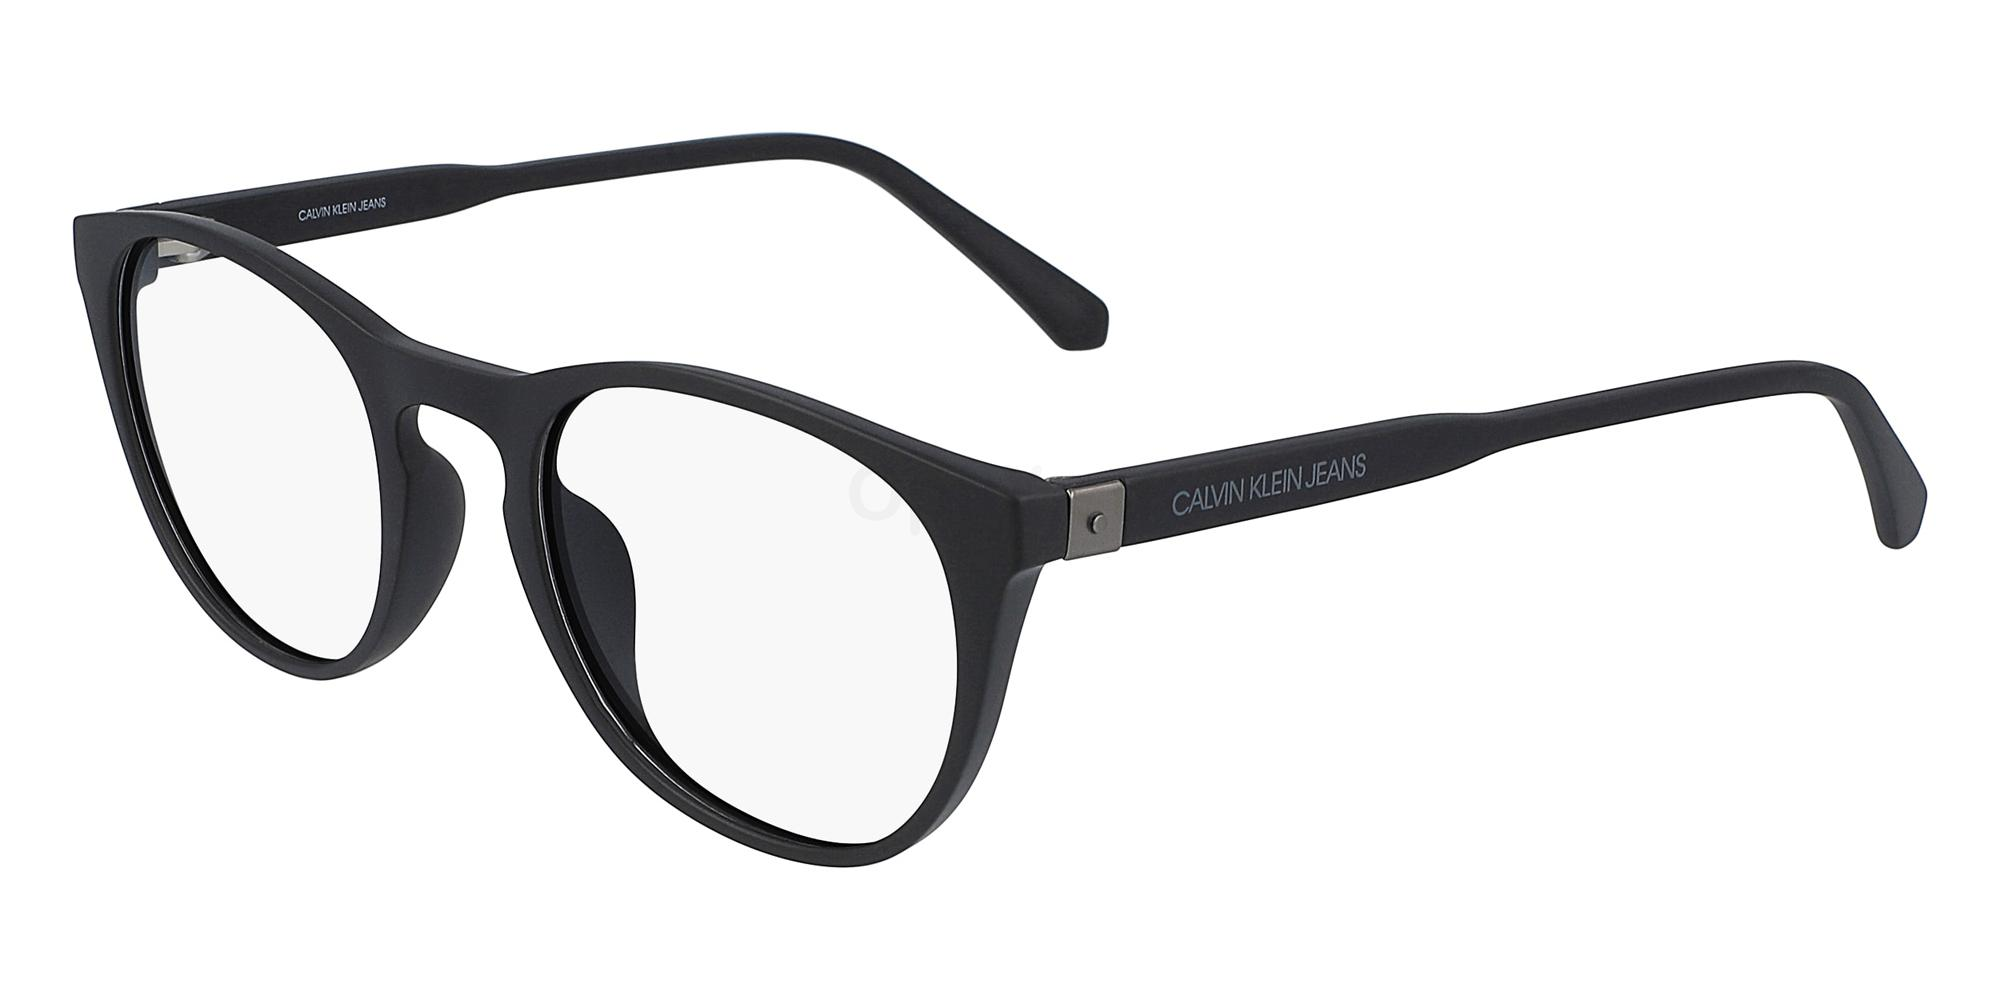 001 CKJ20511 Glasses, Calvin Klein Jeans